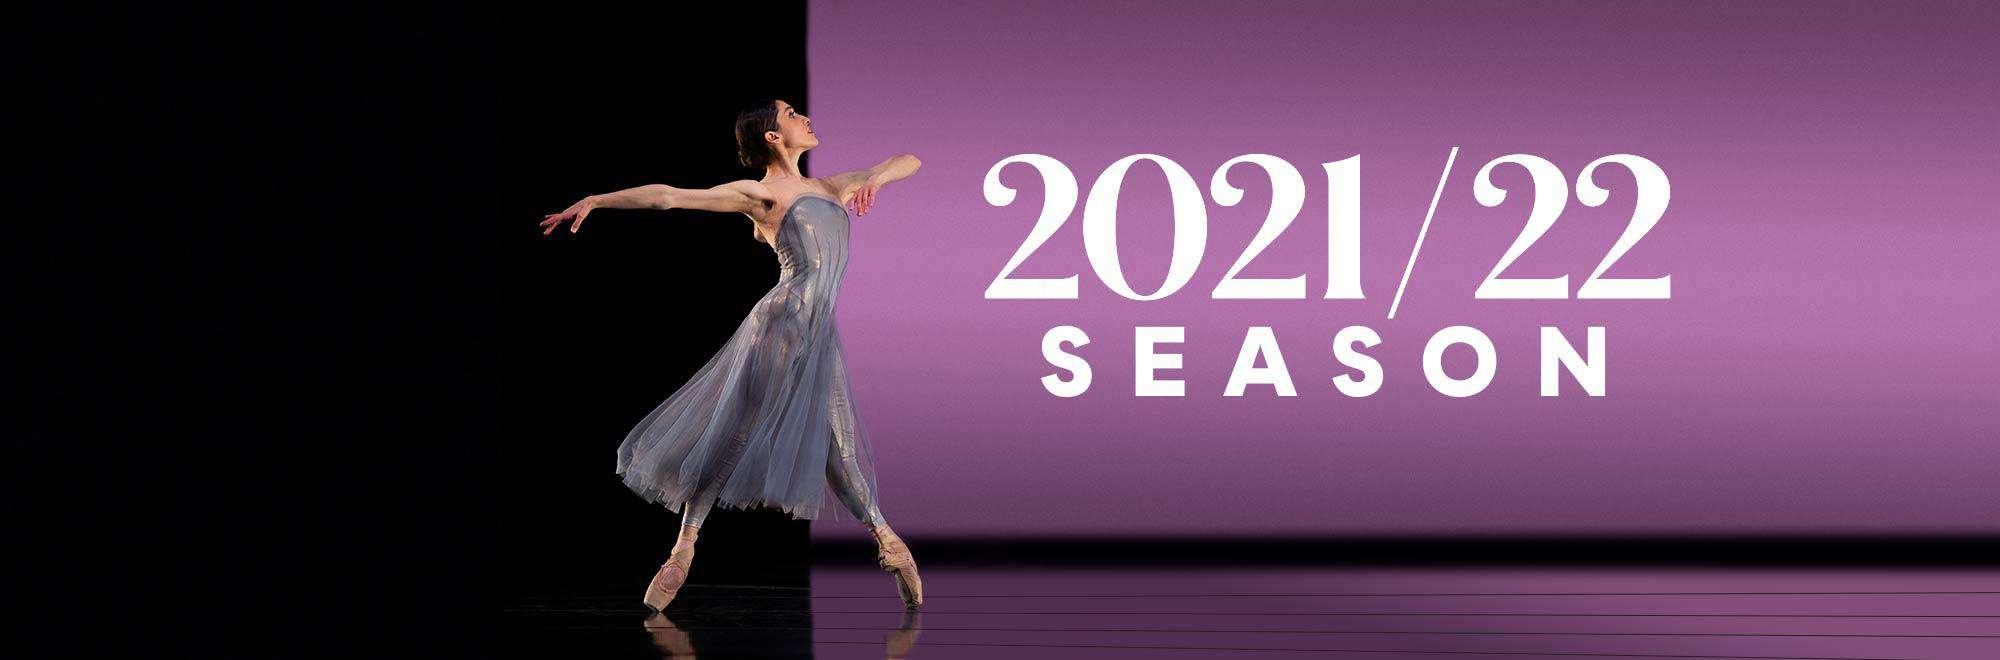 2021/22 Season